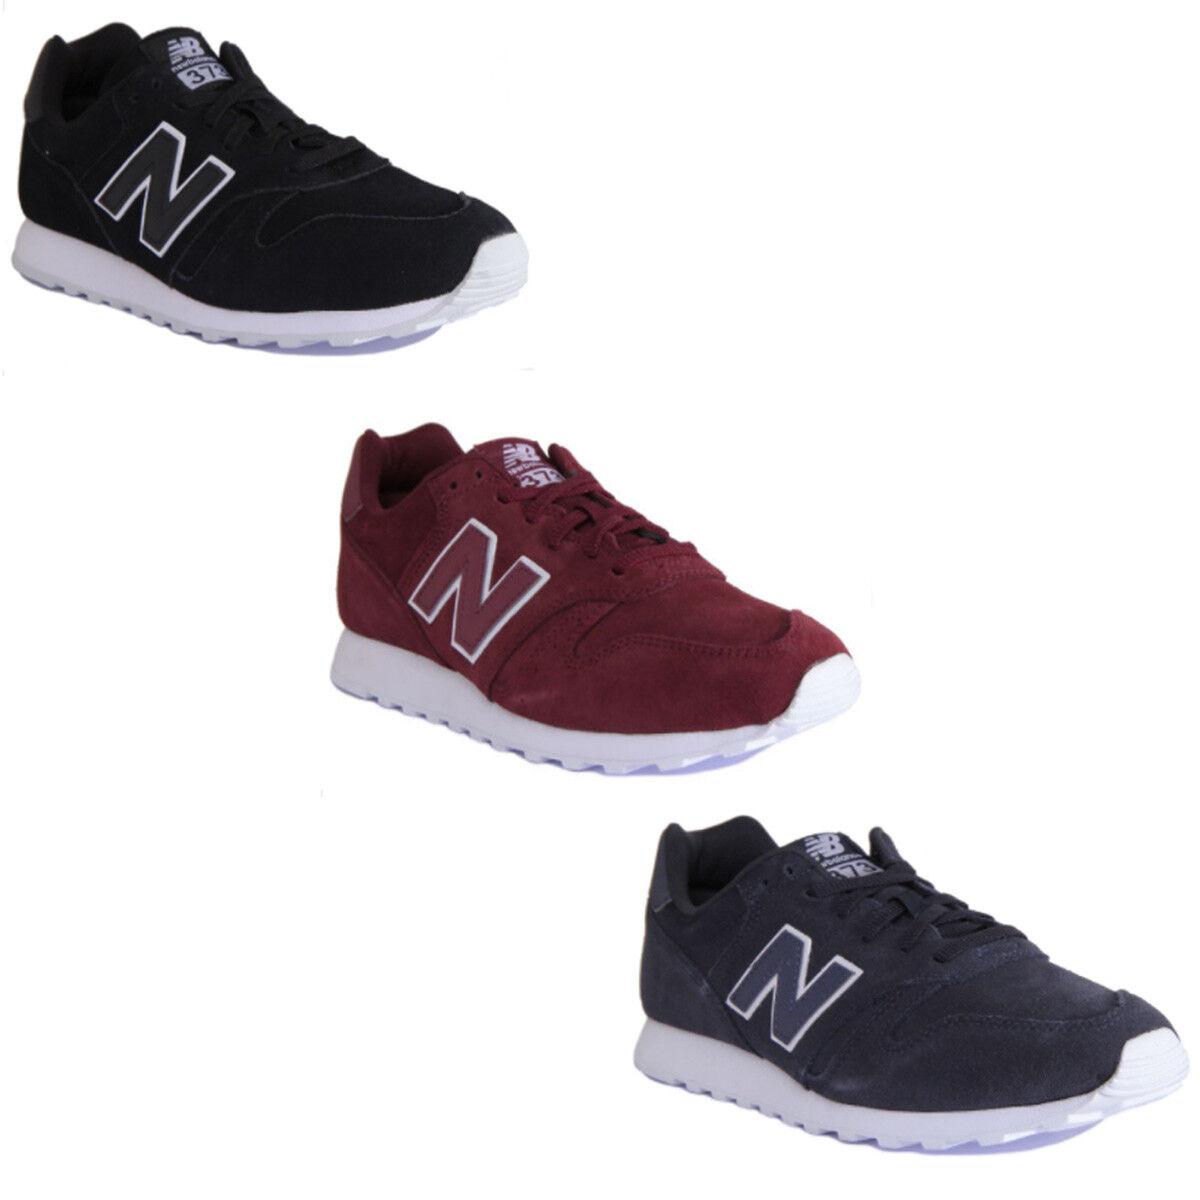 New New New Balance MI373TN Classique Moderne Hommes en Daim Cuir Noir Blanc Baskets 7-12.5 591e5a